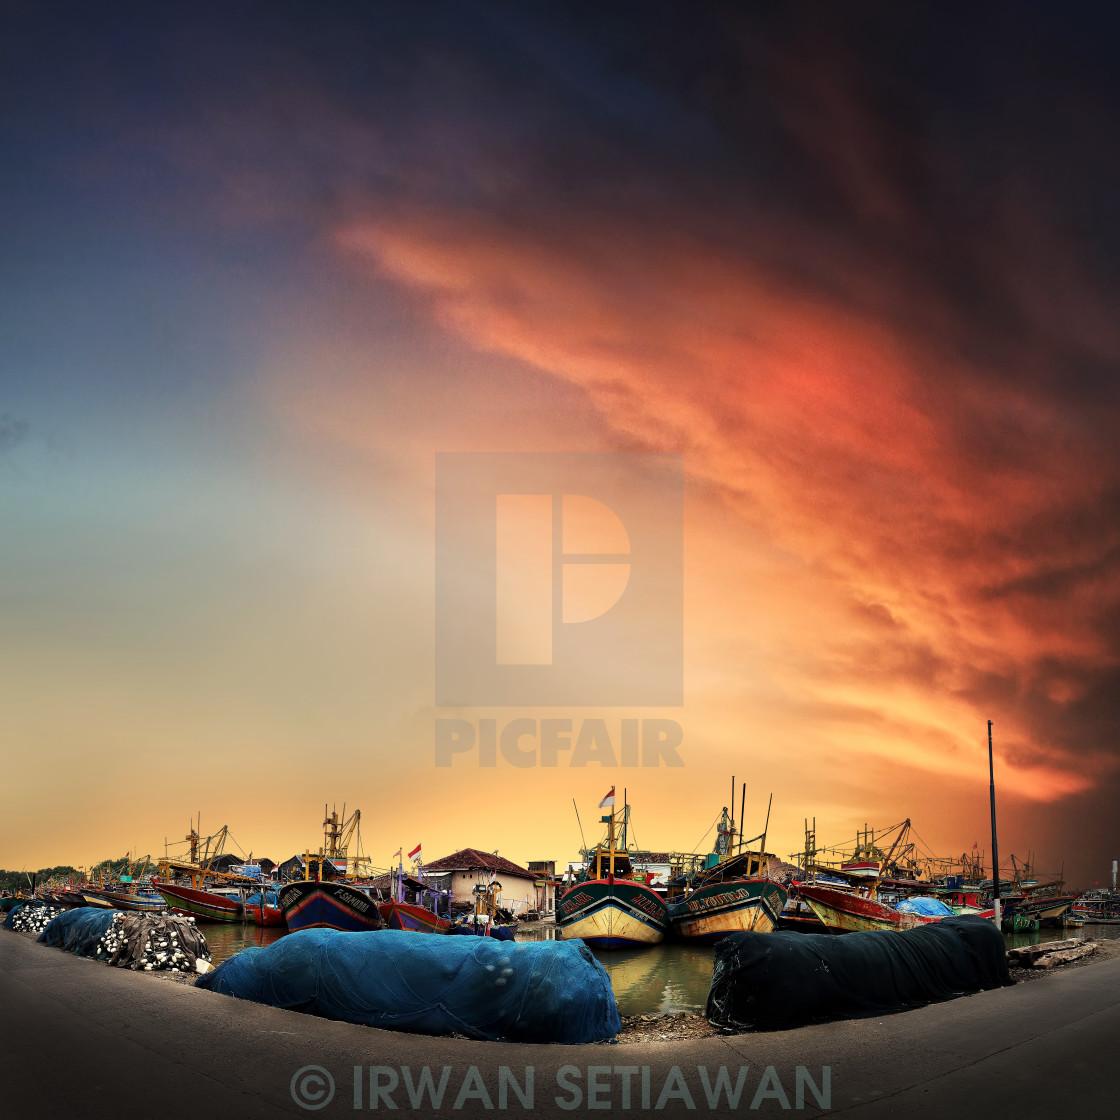 """Betahlawang"" stock image"